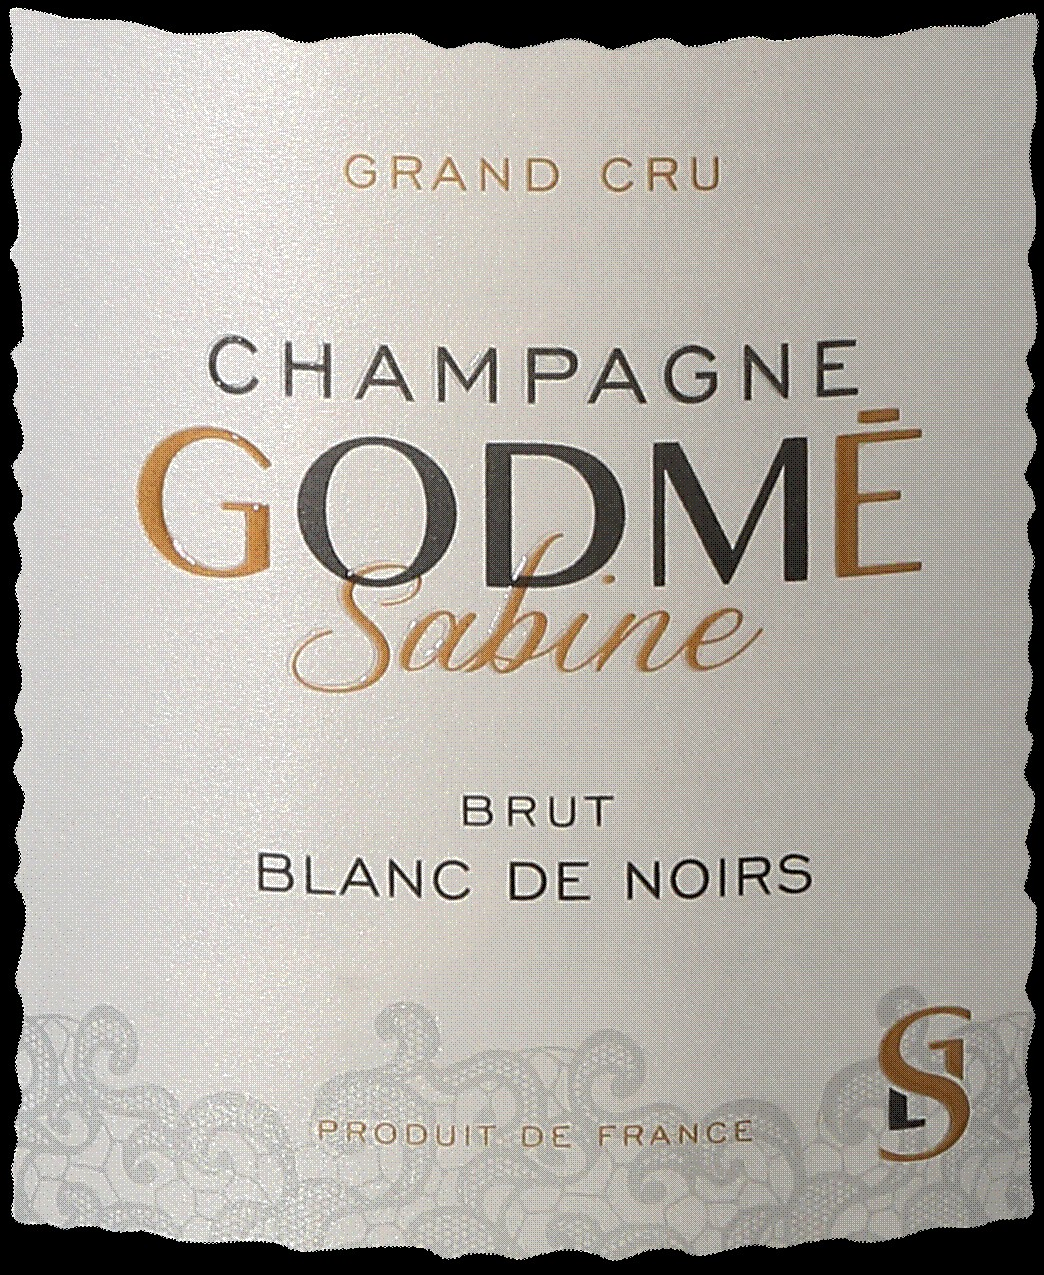 Champagne_Sabine_Godmé